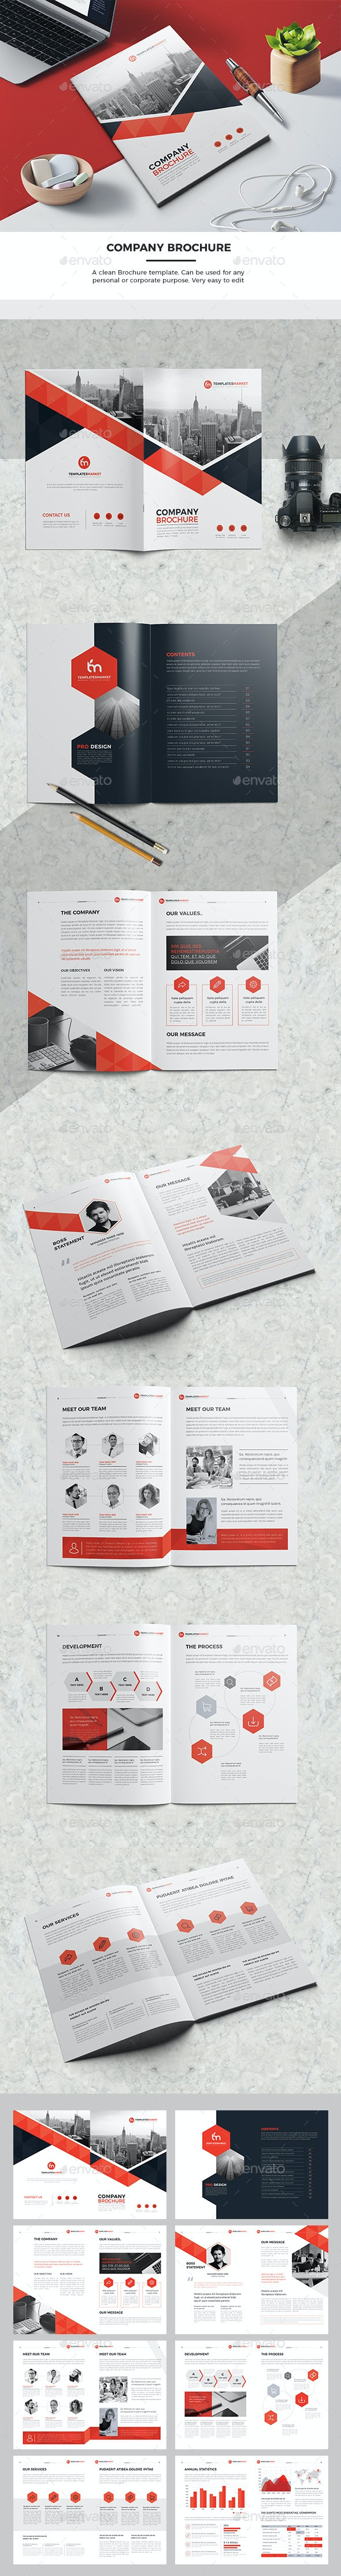 TM Company Brochure - Corporate Brochures